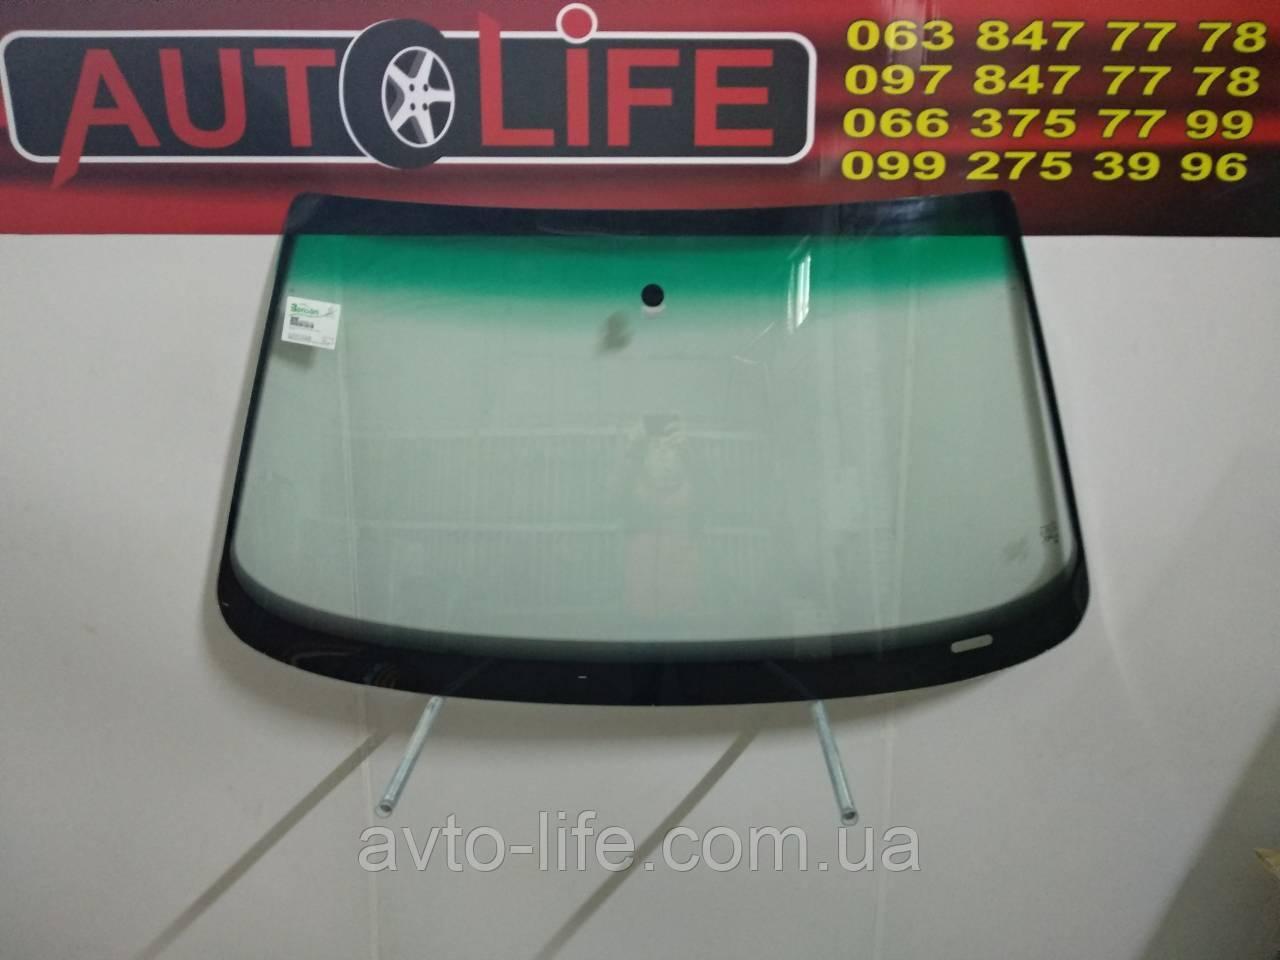 Лобовое стекло Audi A8 (Седан) (1994-1998) | Лобове скло Ауді А8 | Автостекло Ауди А8